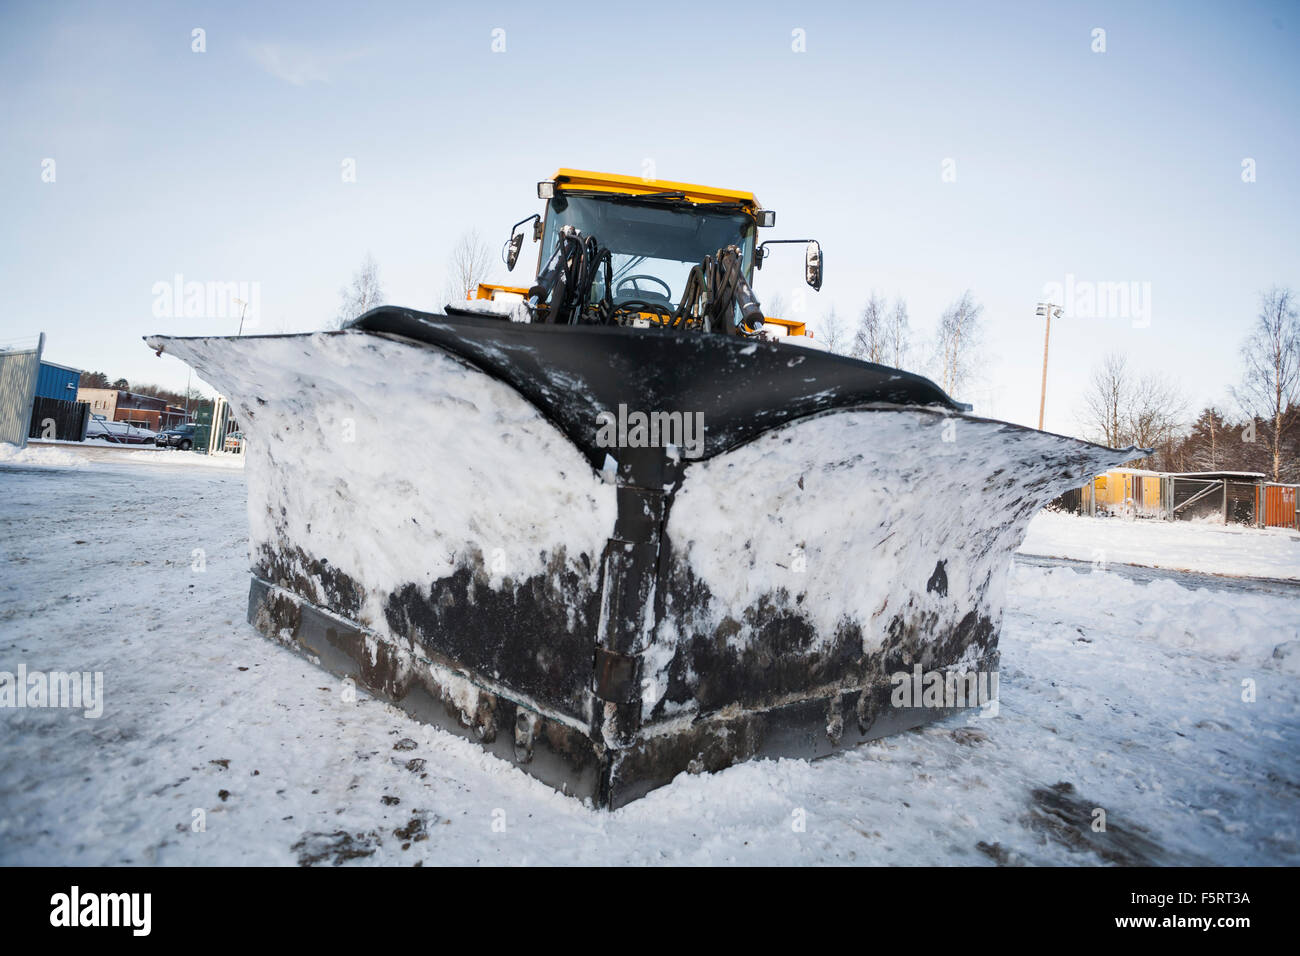 Sweden, Sodermanland, Stockholms Lan, Haninge, View of snowplow - Stock Image